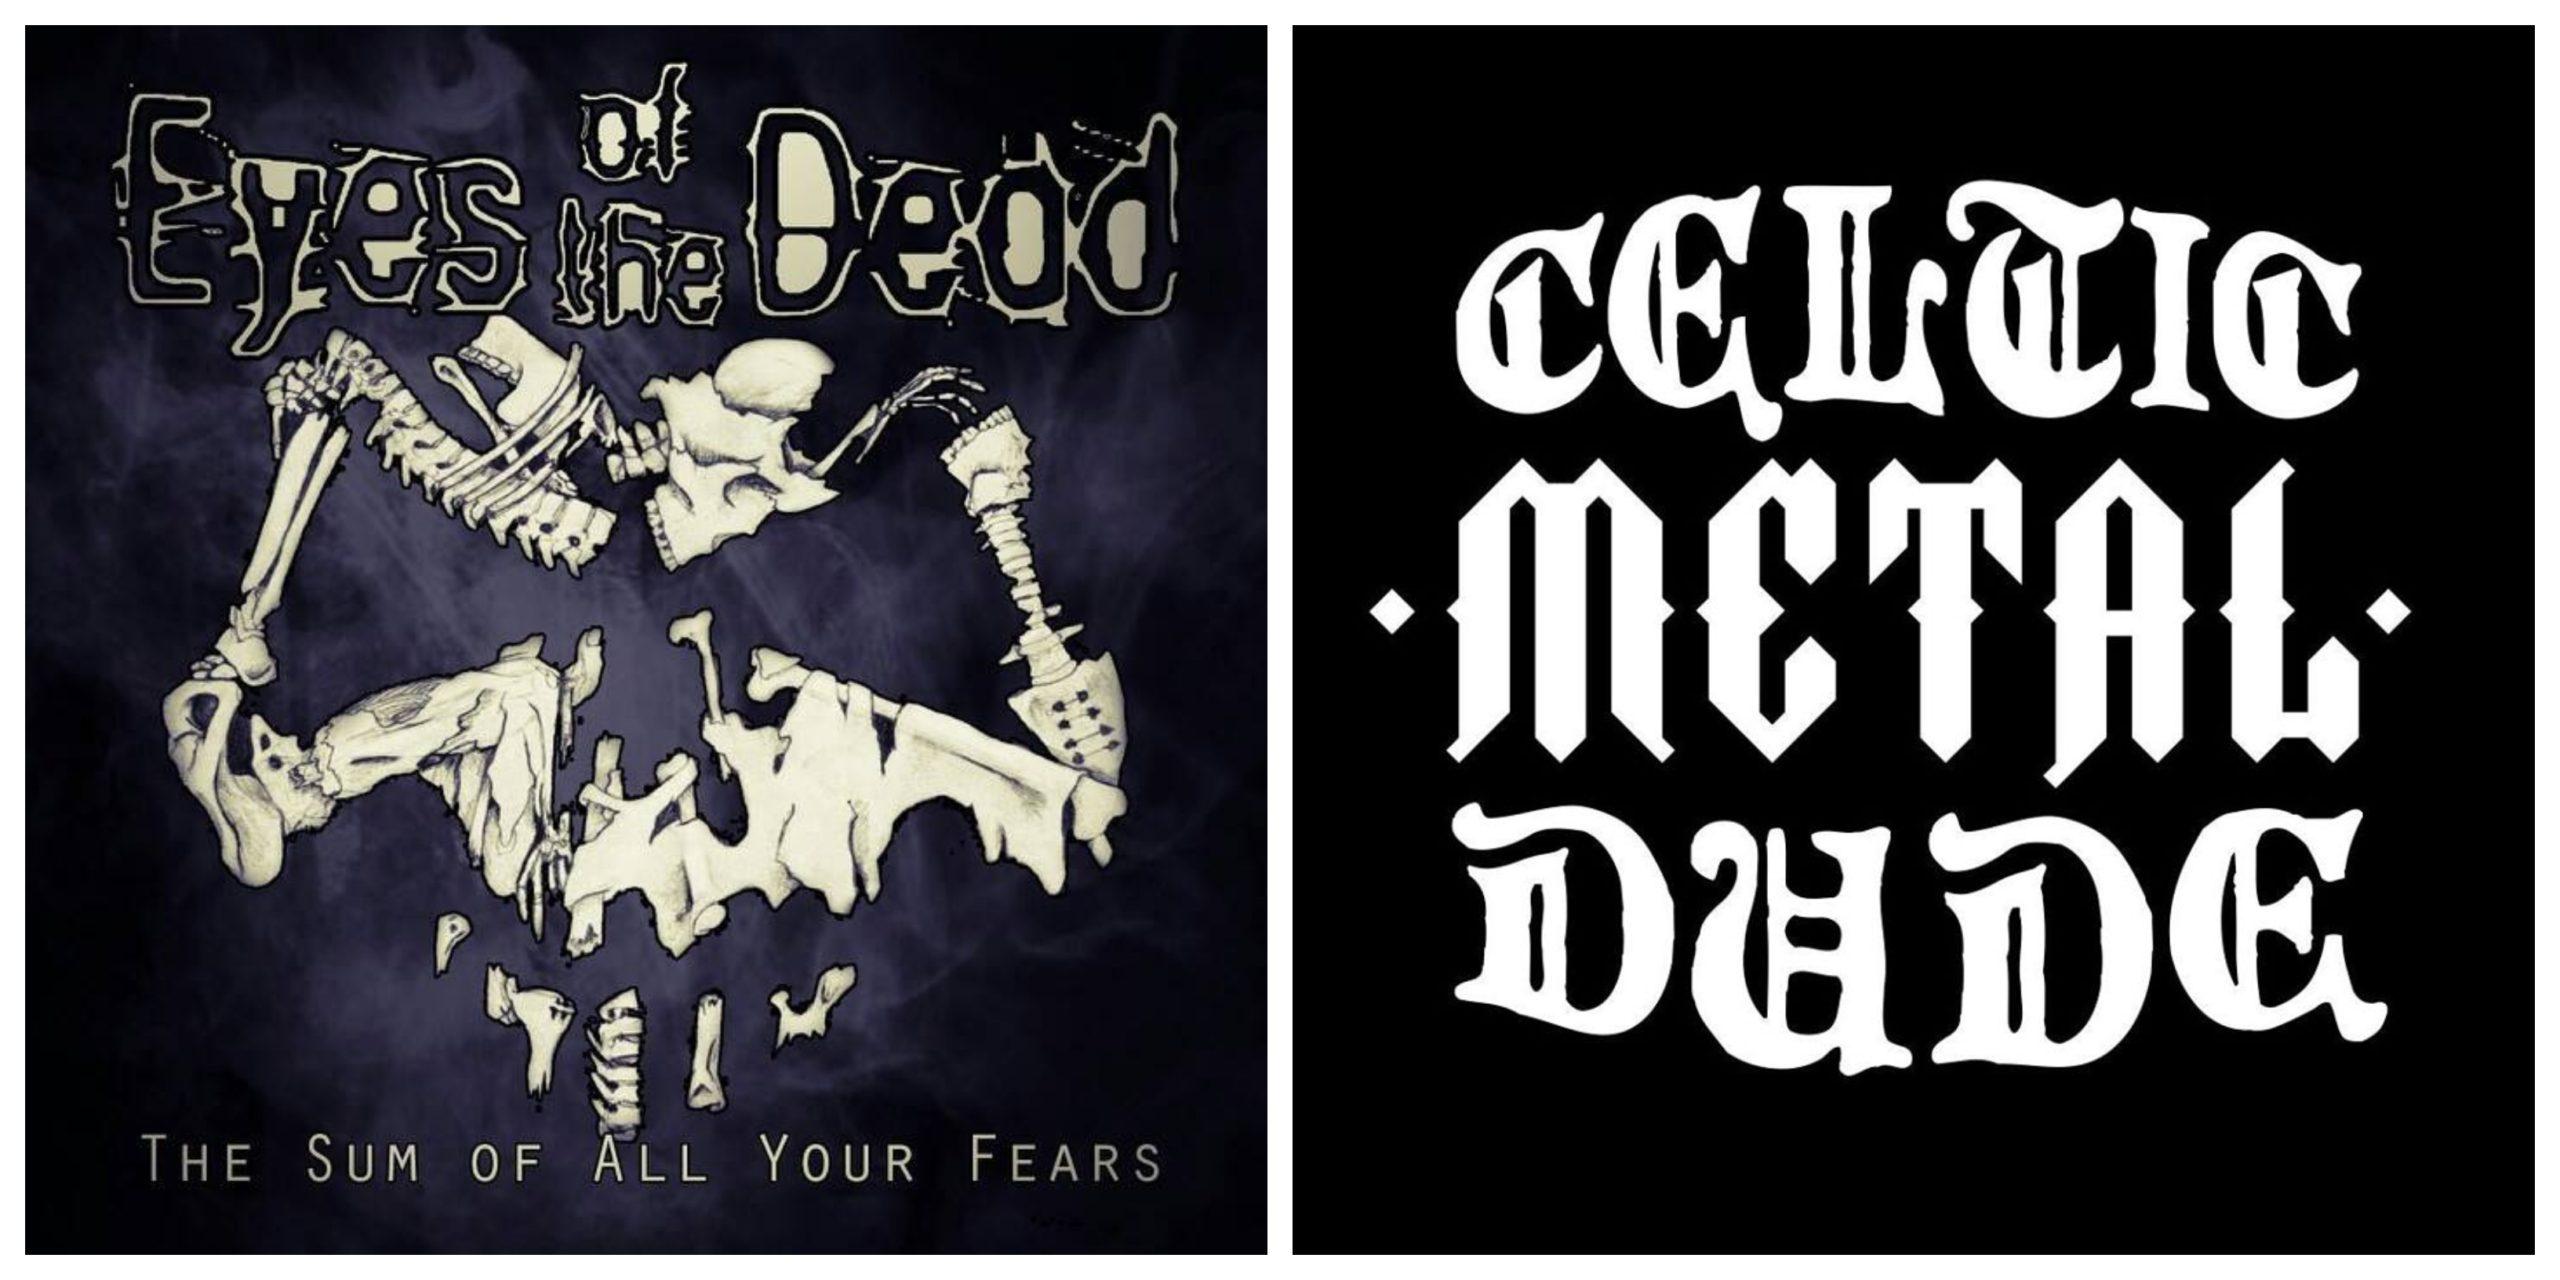 eyes of the dead celtic metal dude